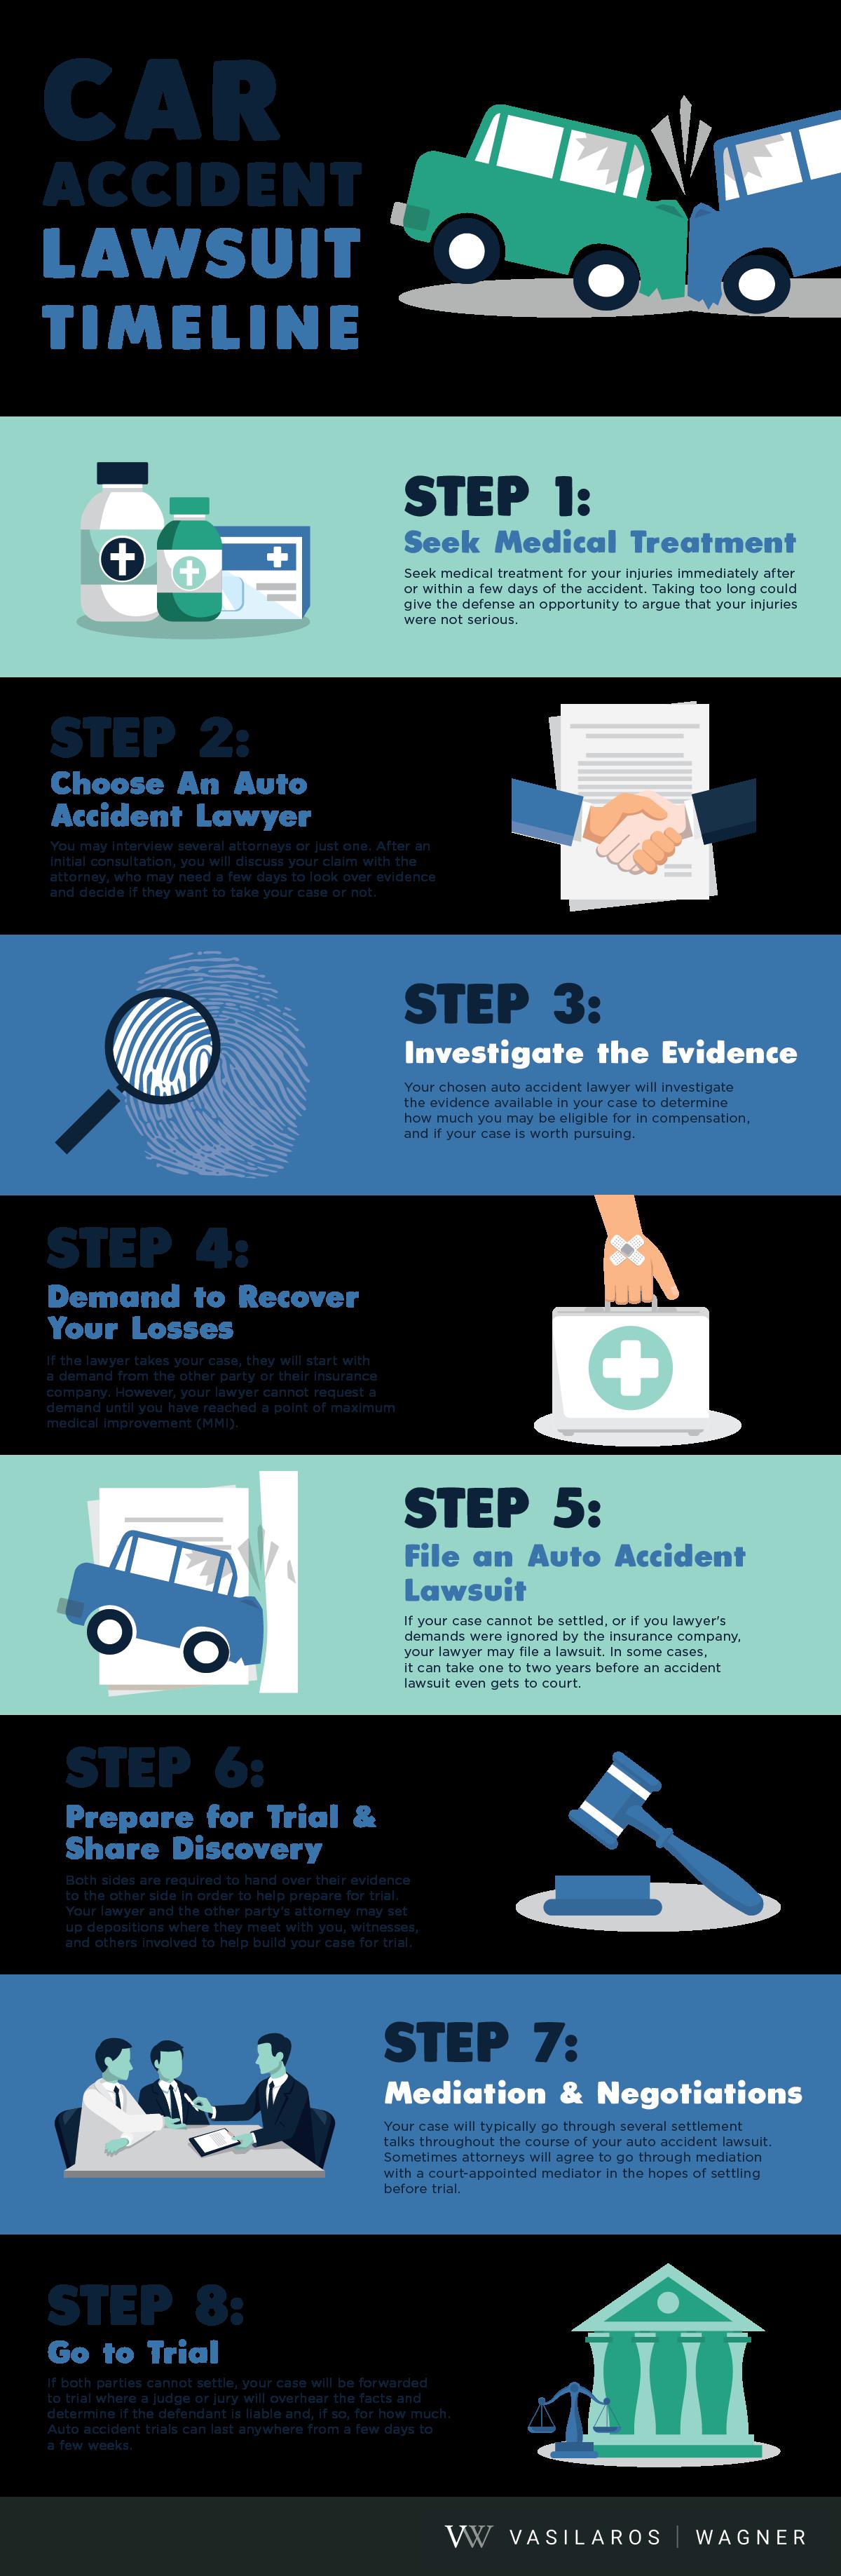 car accident lawsuit timeline infographic